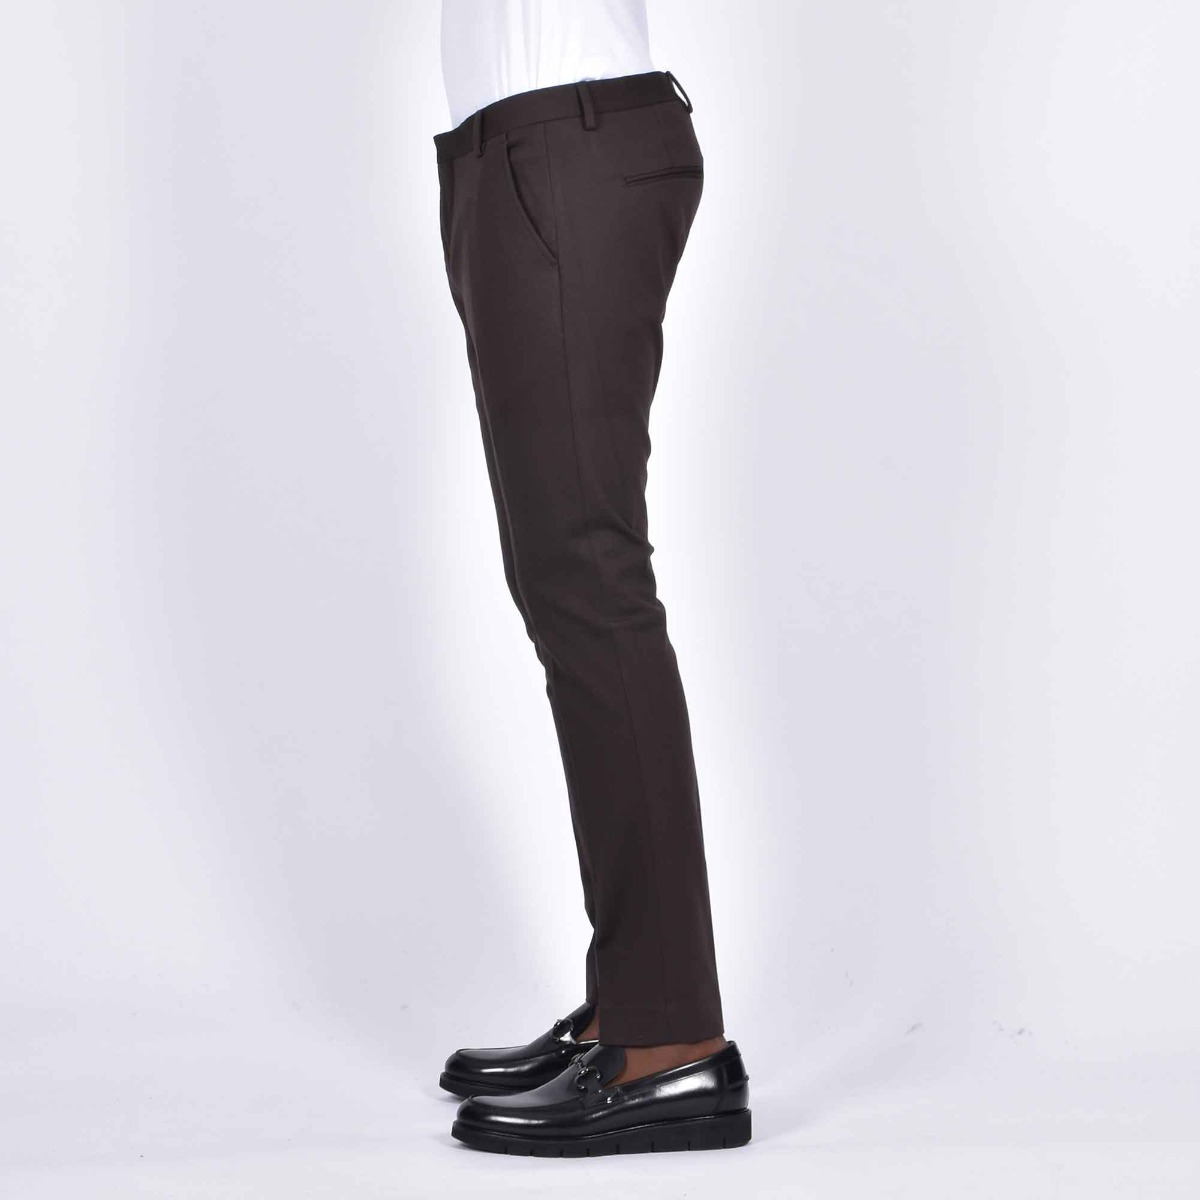 Pantalone tasca america milano- Moro